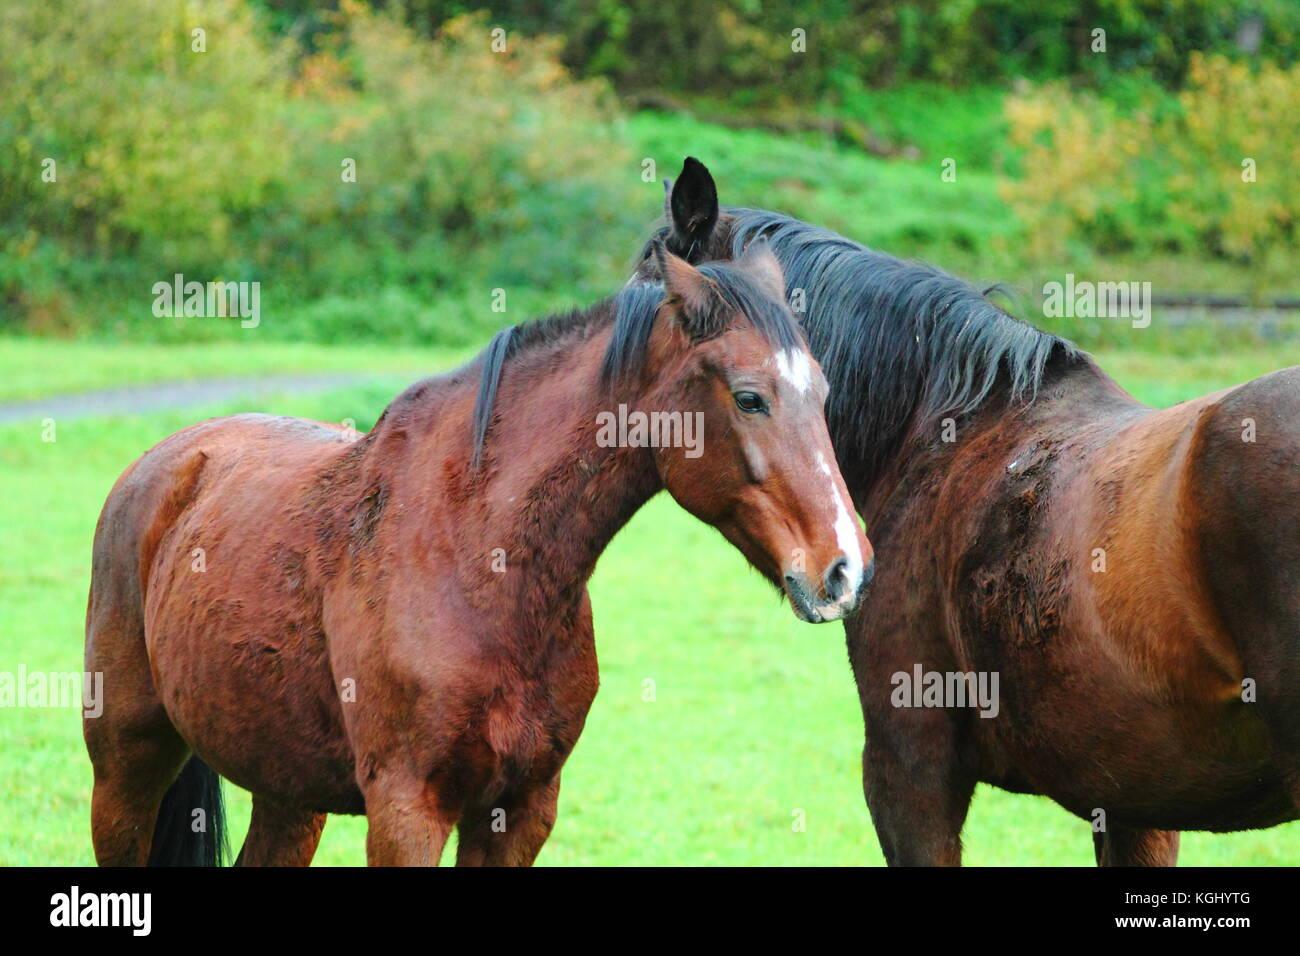 Chestnut Horses Stock Photos & Chestnut Horses Stock ... - photo#5